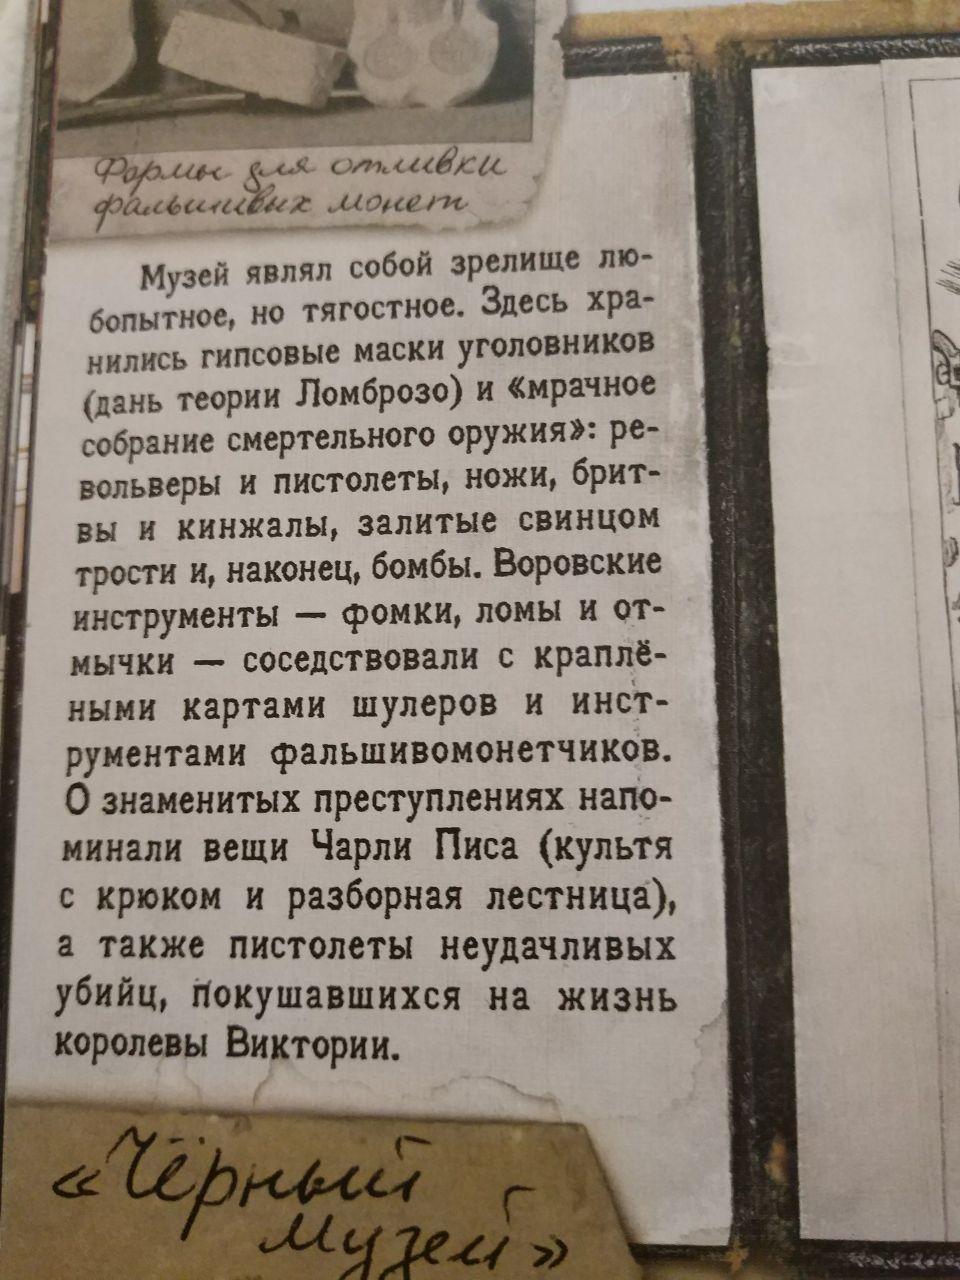 http://s5.uploads.ru/xVuqb.jpg